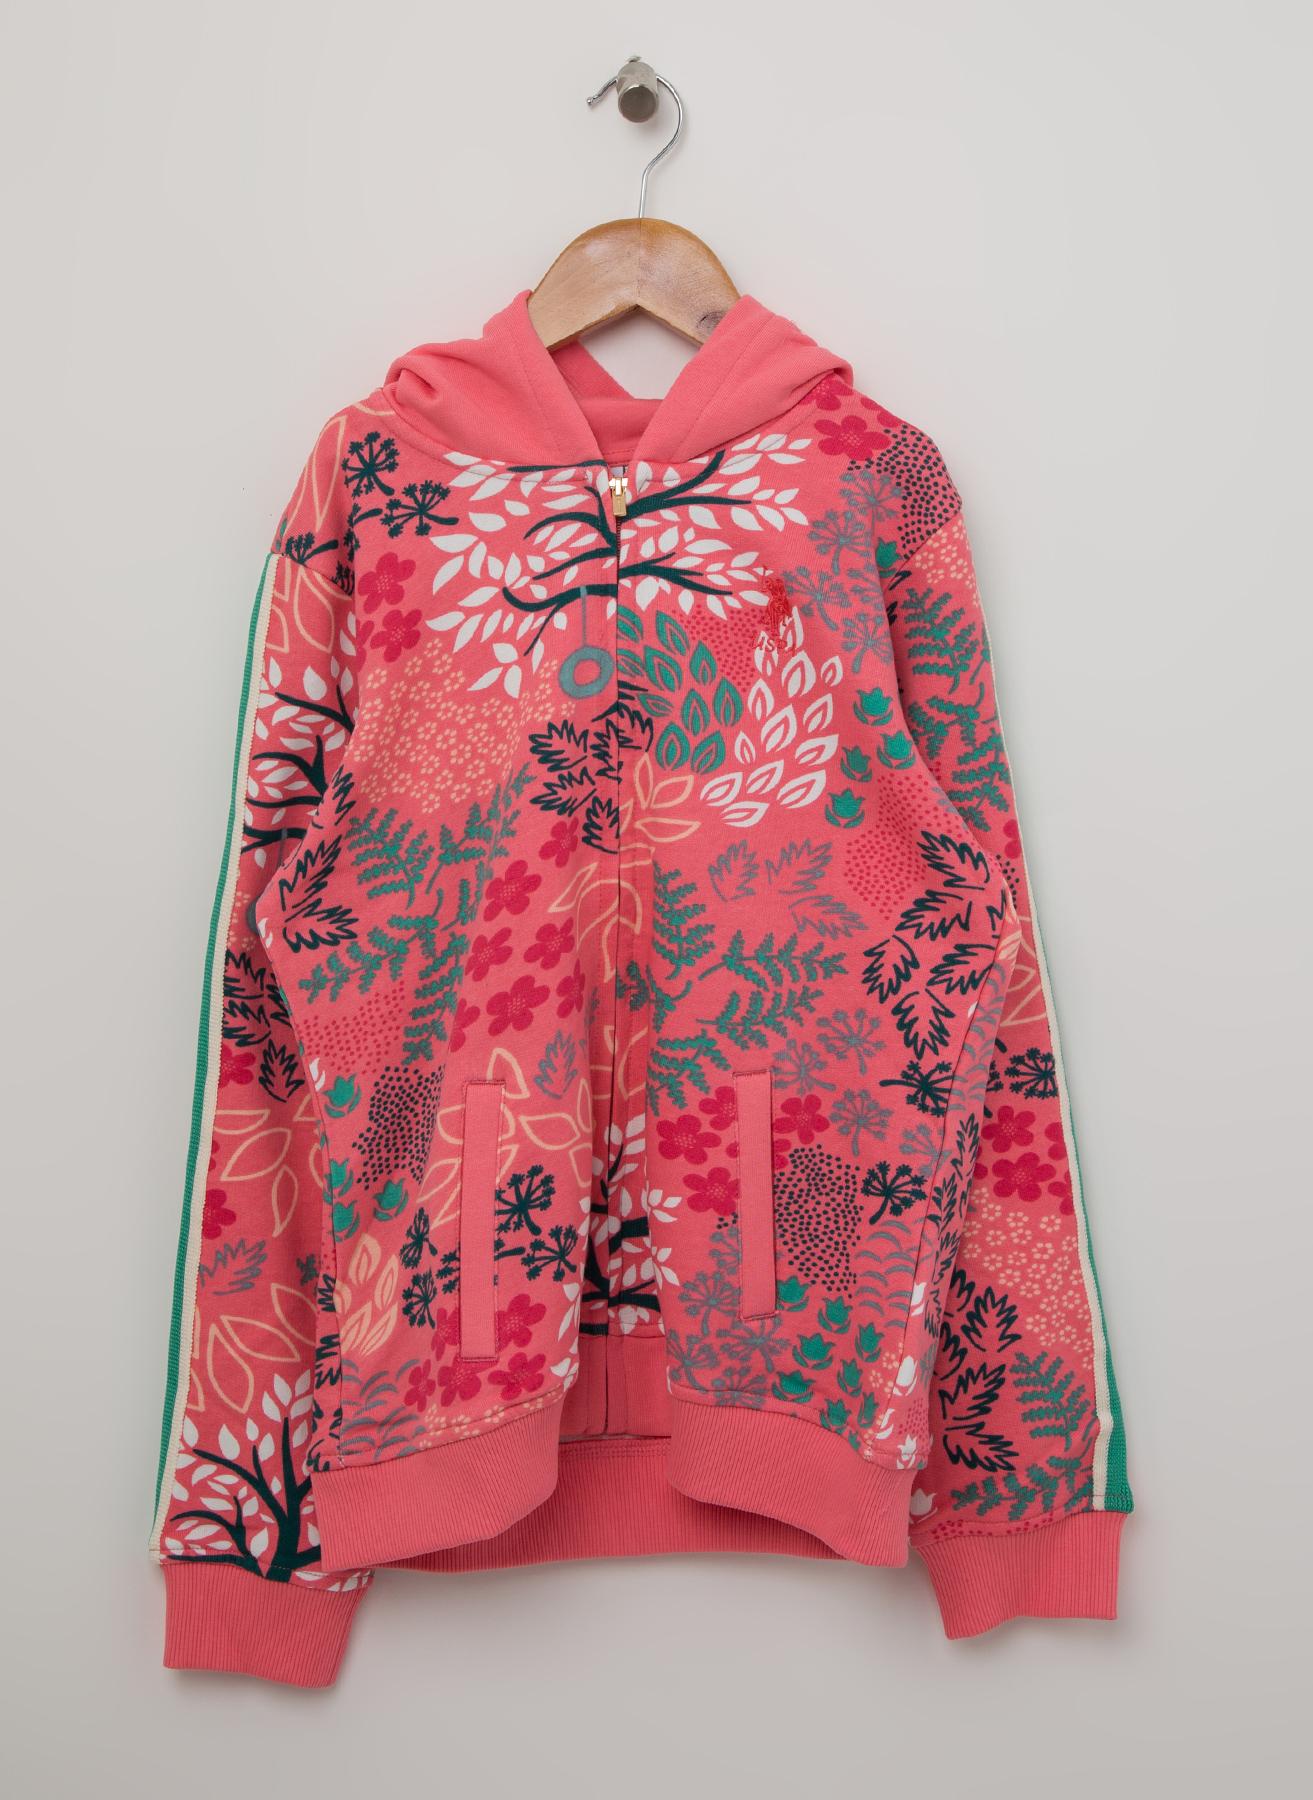 U.S. Polo Assn. Kapüşonlu Sweatshirt 10 Yaş 5001704820001 Ürün Resmi